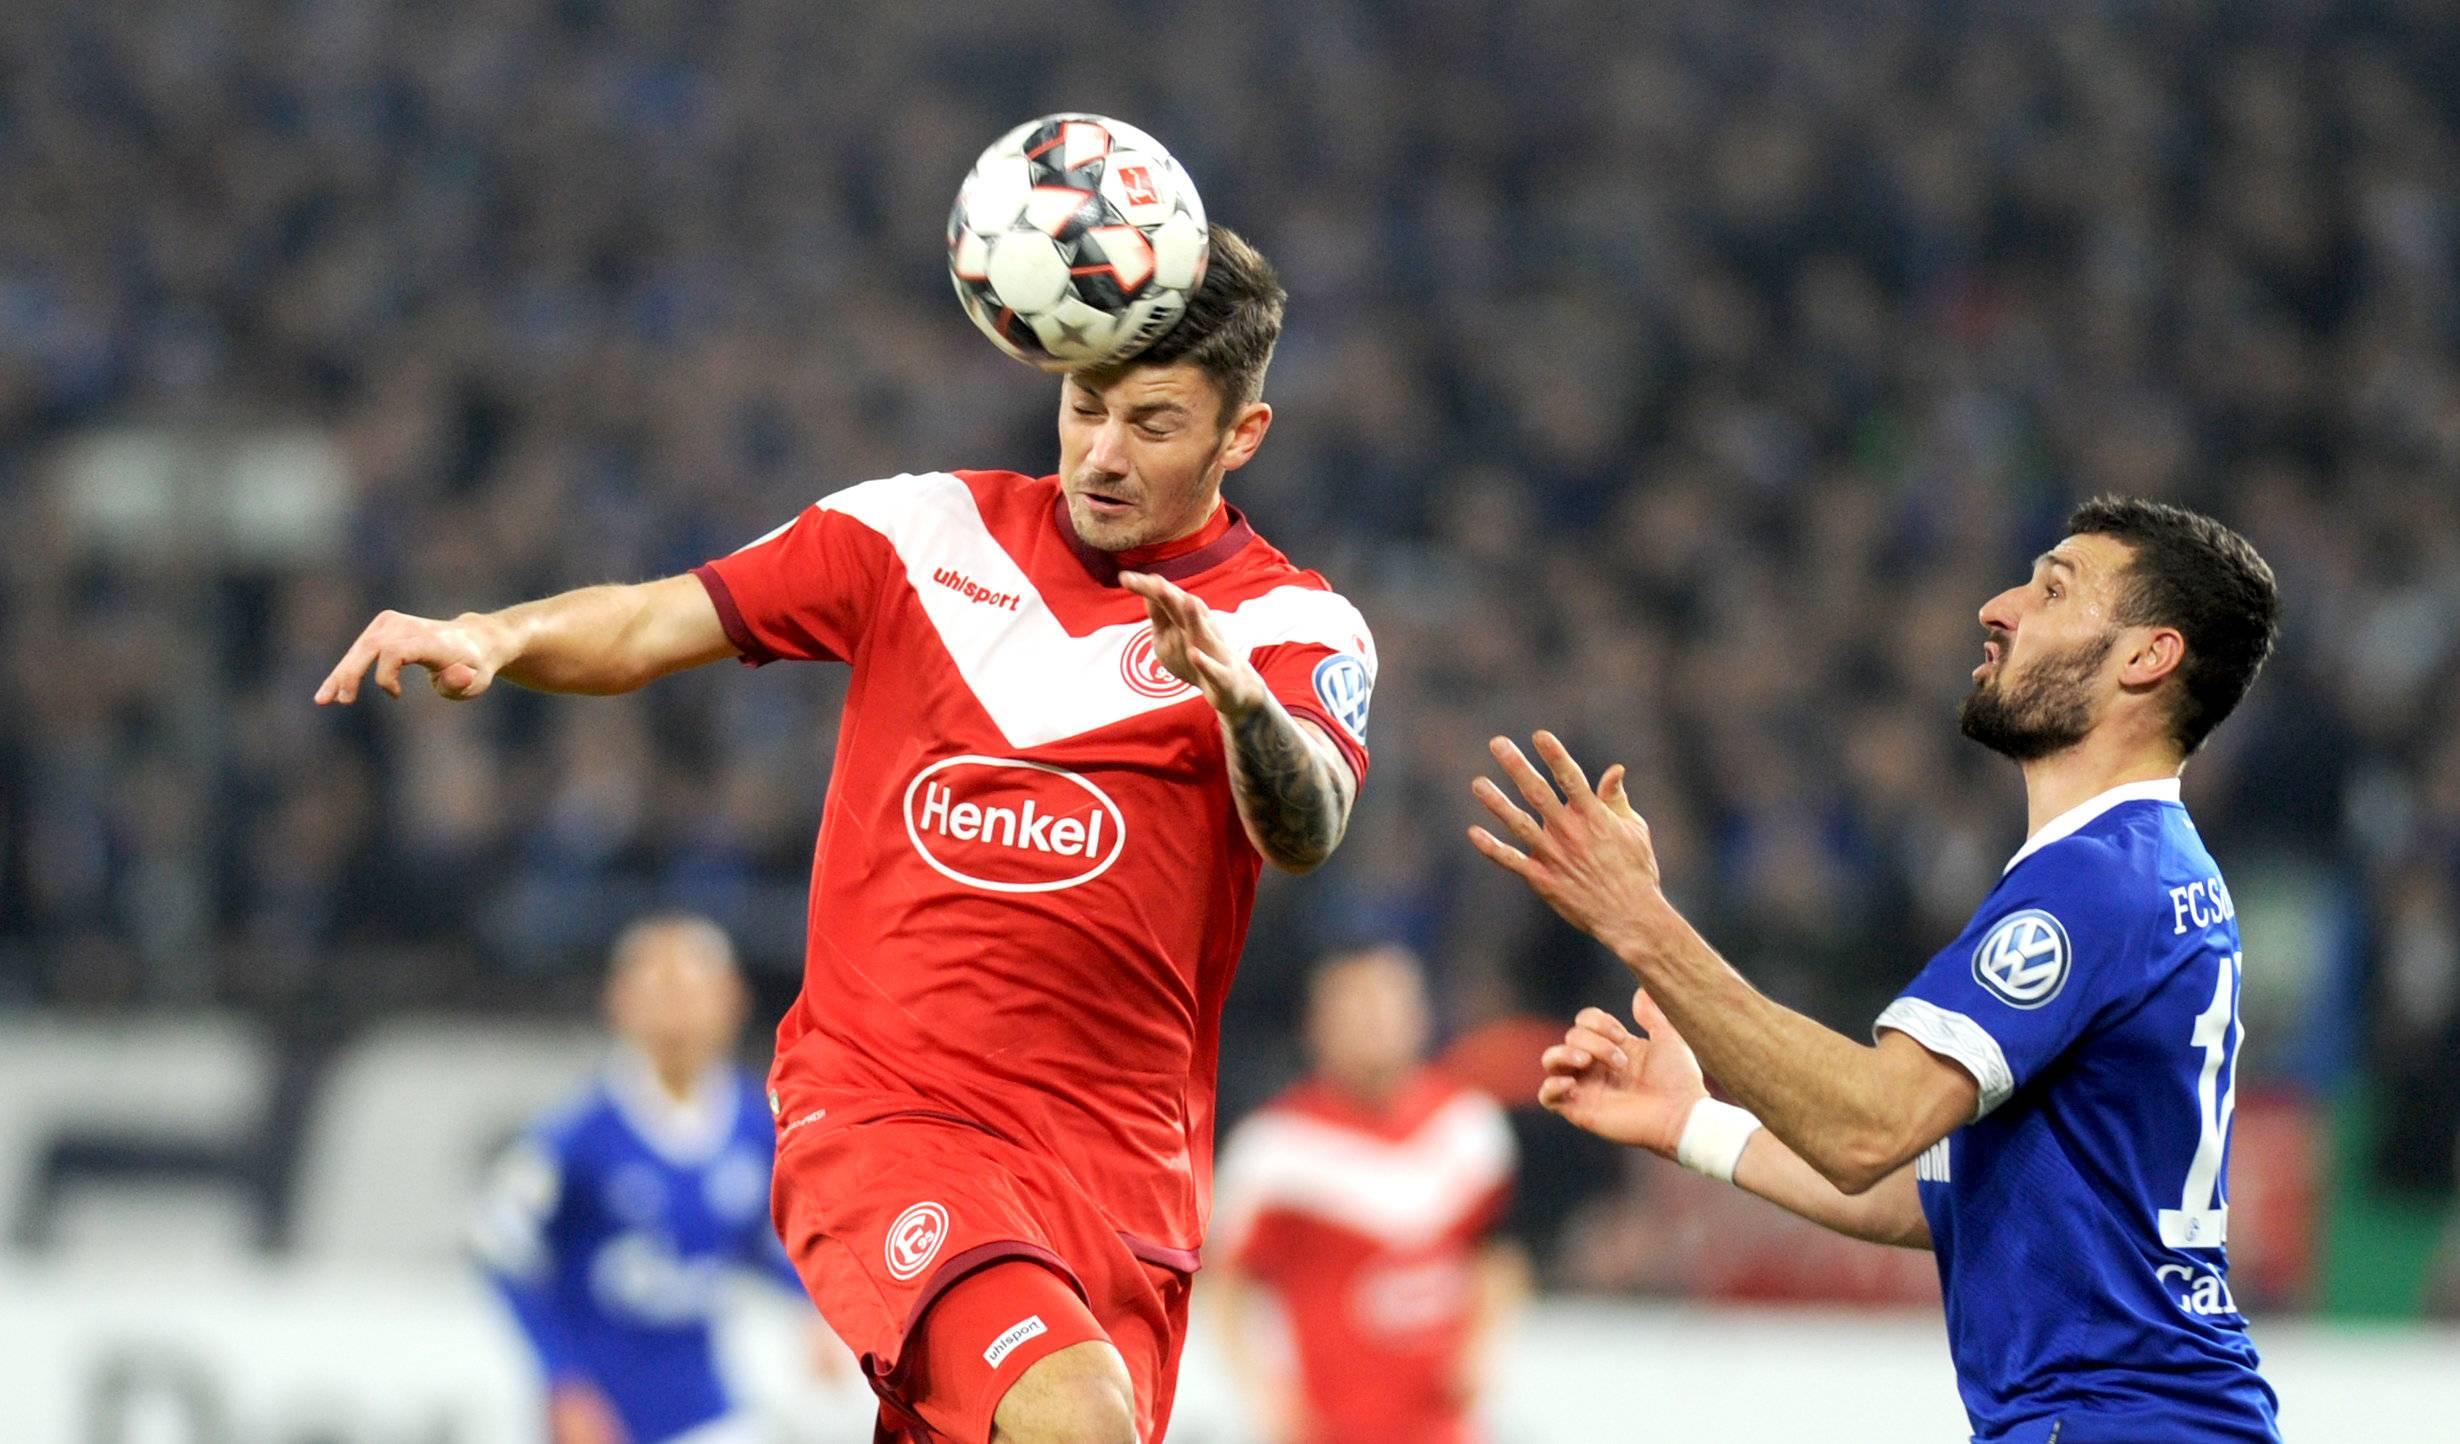 Schalke Düsseldorf Dfb Pokal